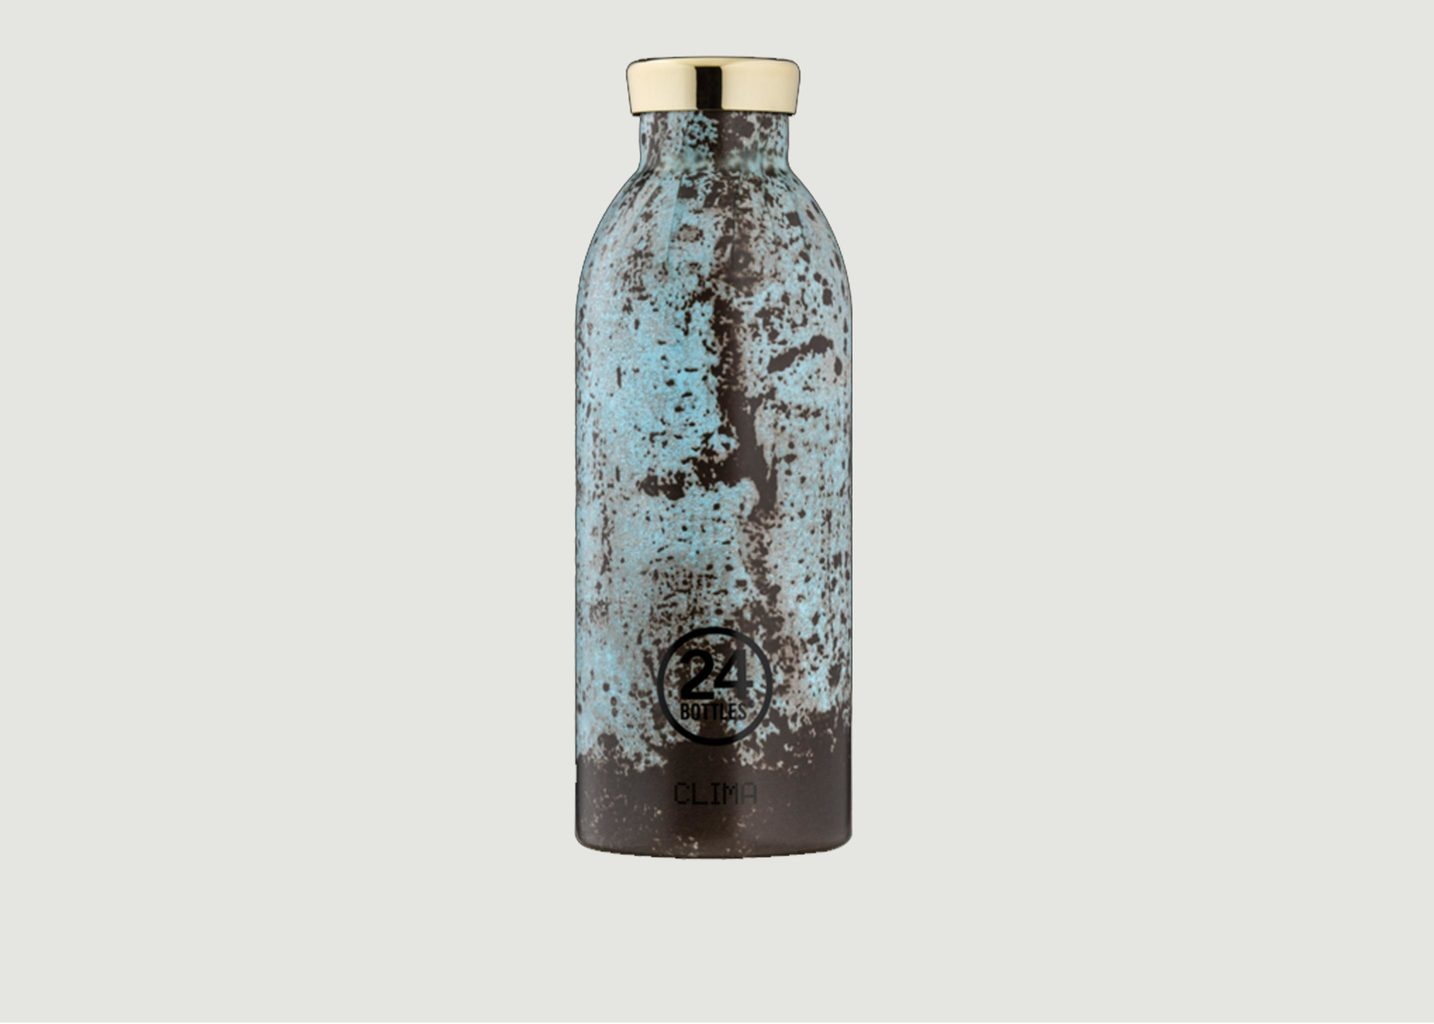 Clima Bottle 500ml Isotherme Riace - 24 Bottles